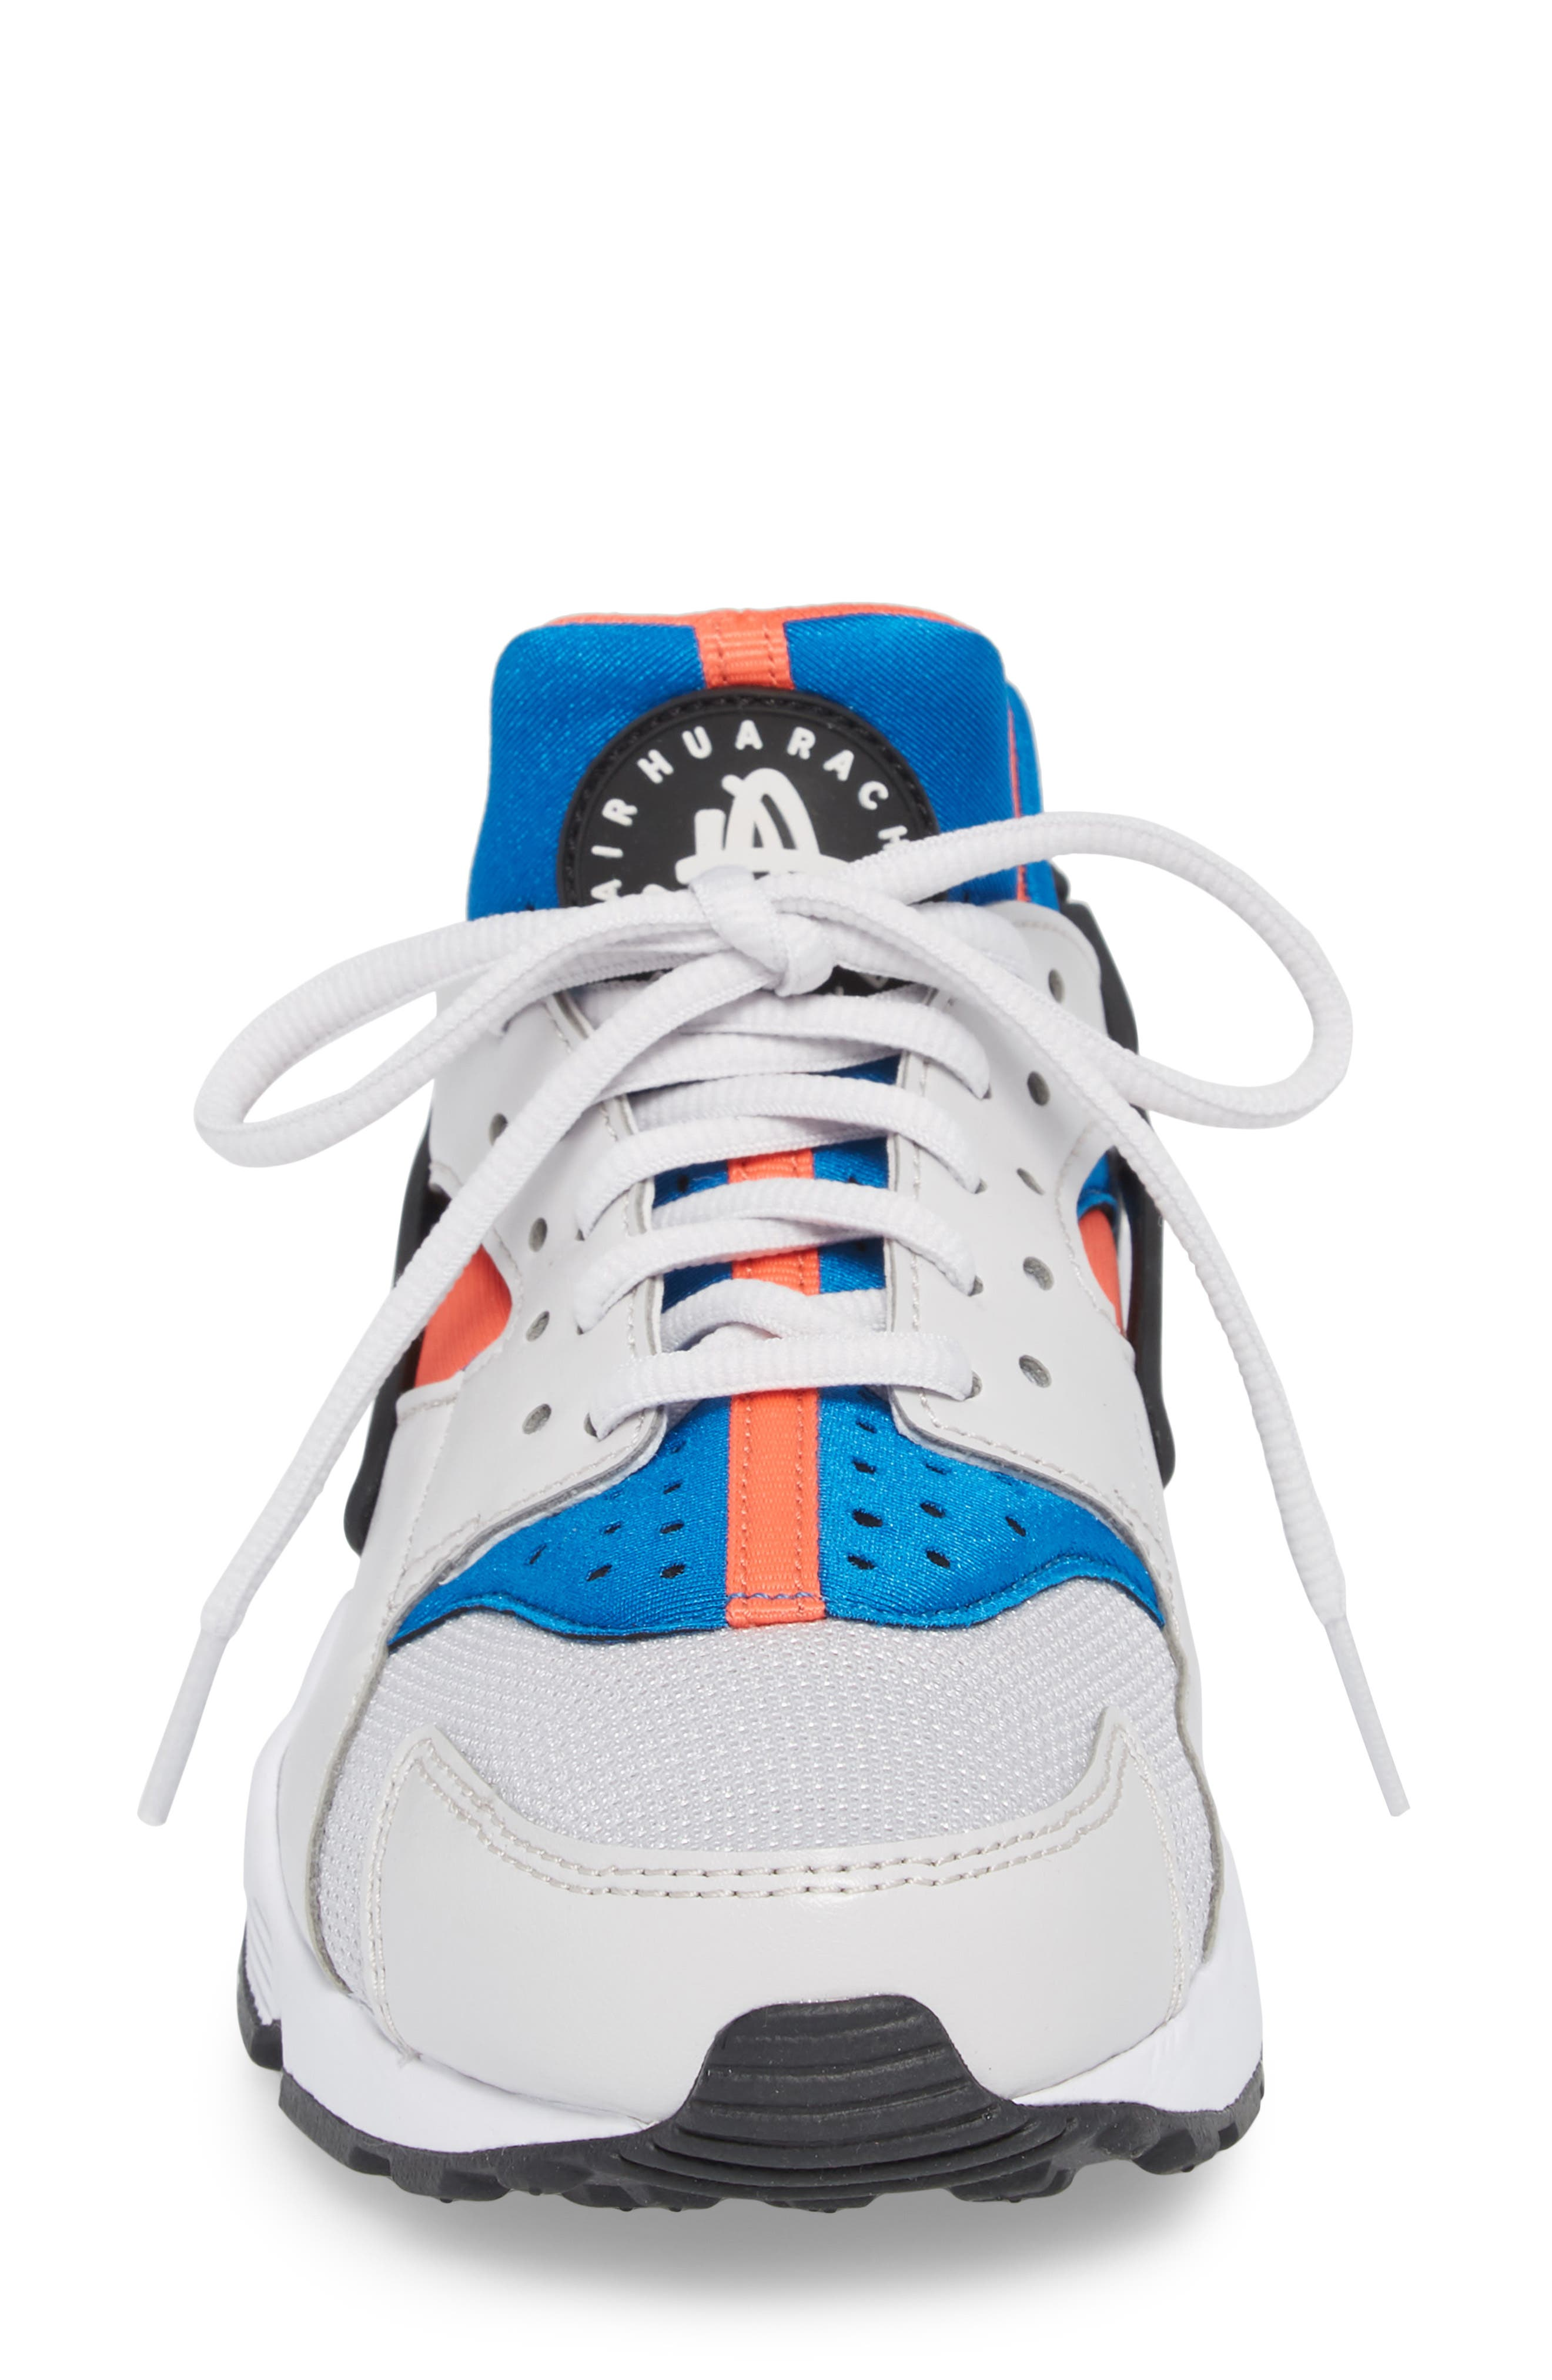 Air Huarache Run Sneaker,                             Alternate thumbnail 4, color,                             Grey/ Black/ Coral/ Nebula